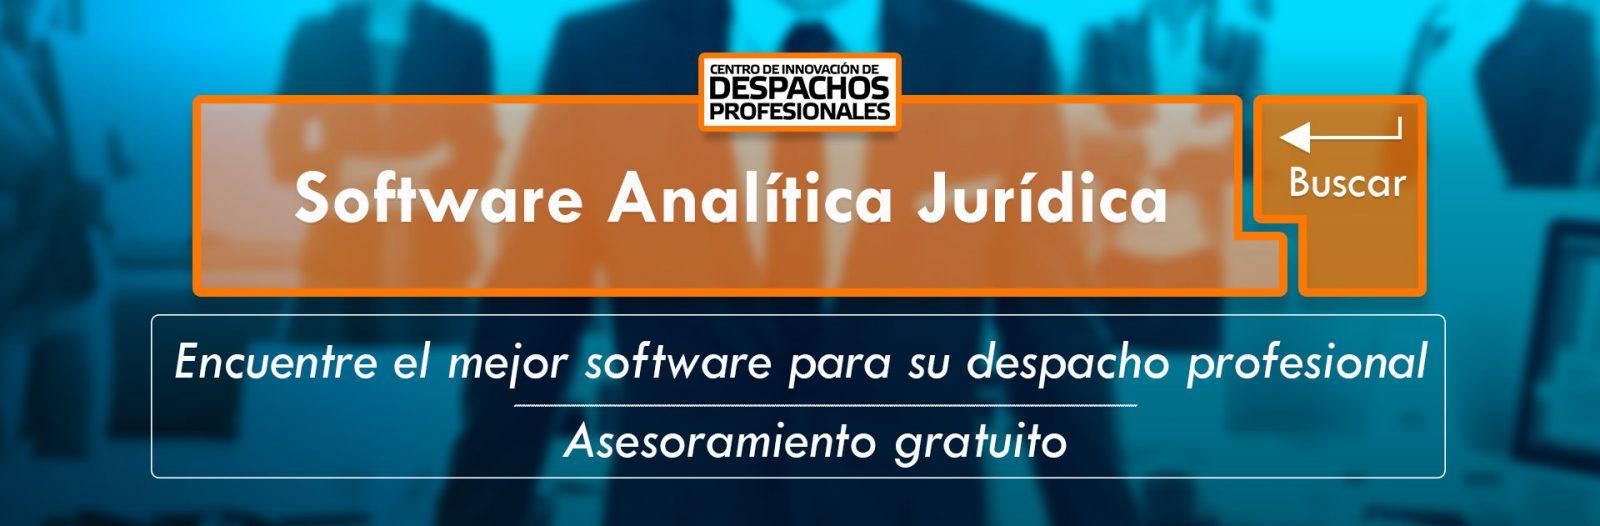 Software Analítica Jurídica